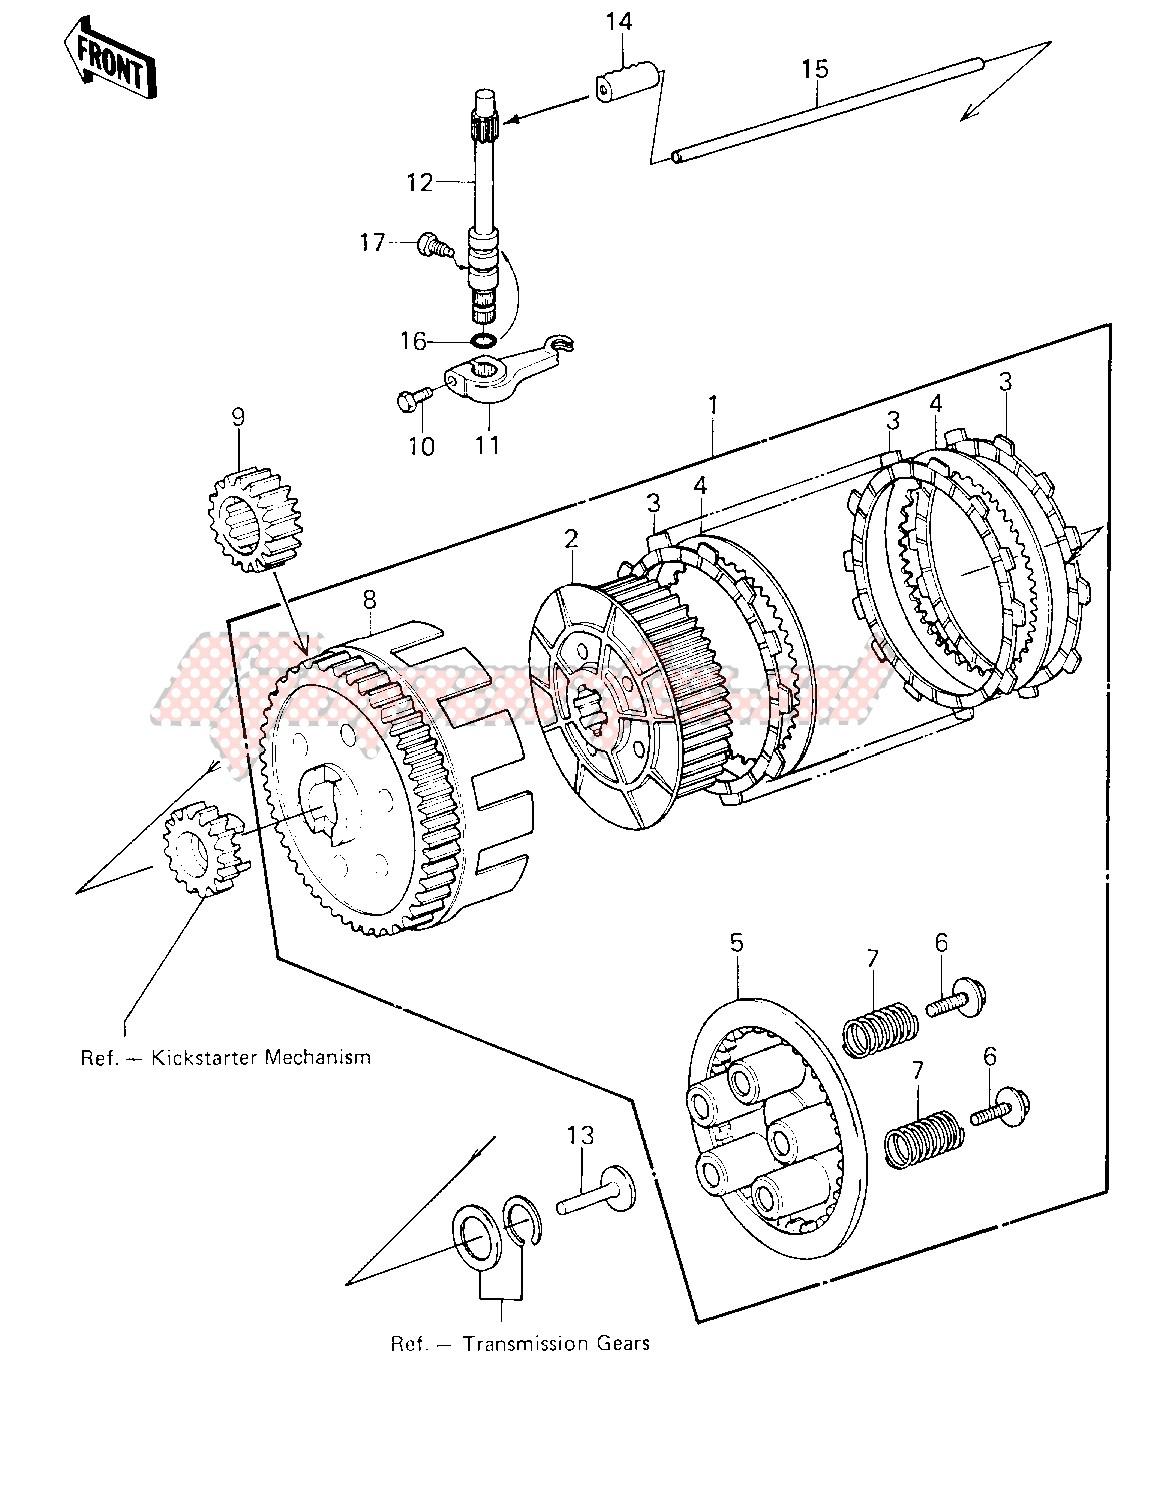 CLUTCH -- 81-82 KLT200-A1_A2_A3- - image